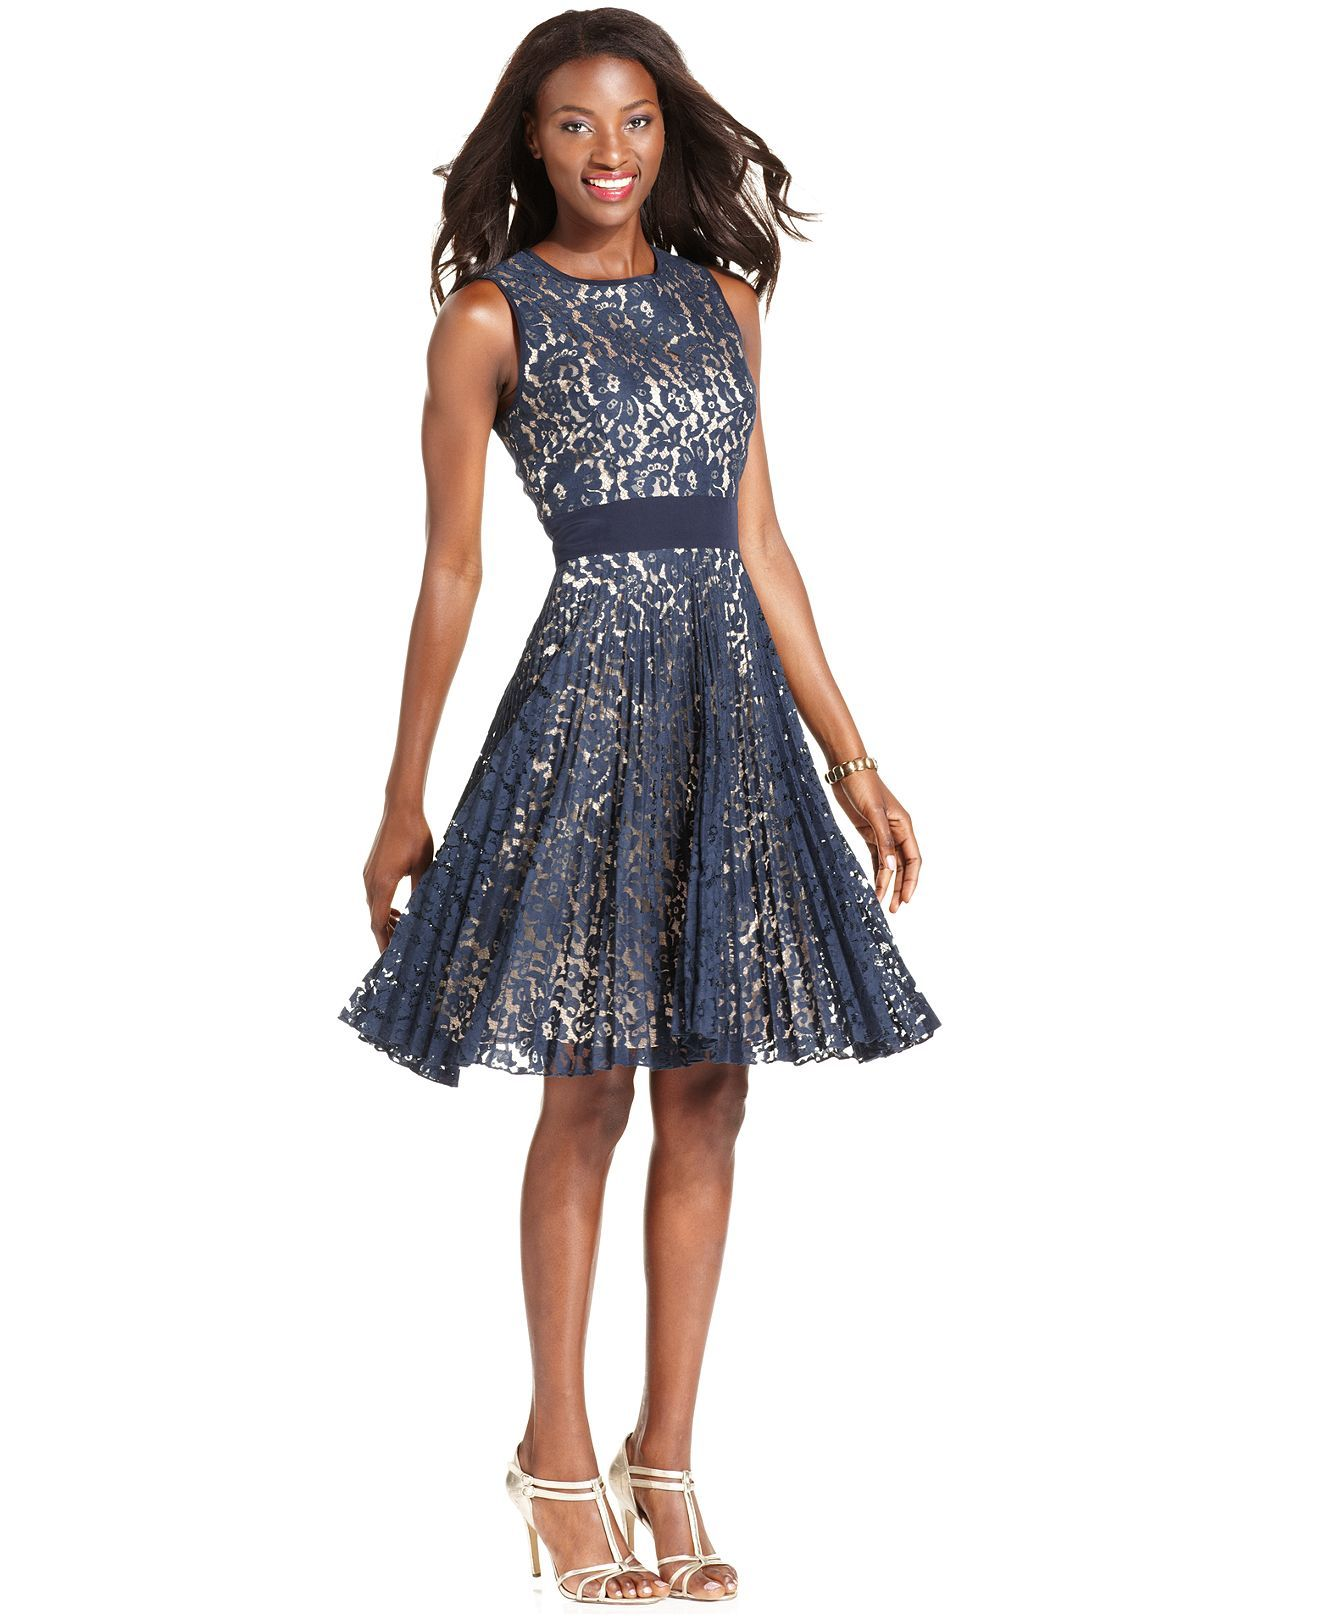 Macys womens dresses wedding  Eliza J Dress Sleeveless Pleated Lace ALine  Womens Dresses